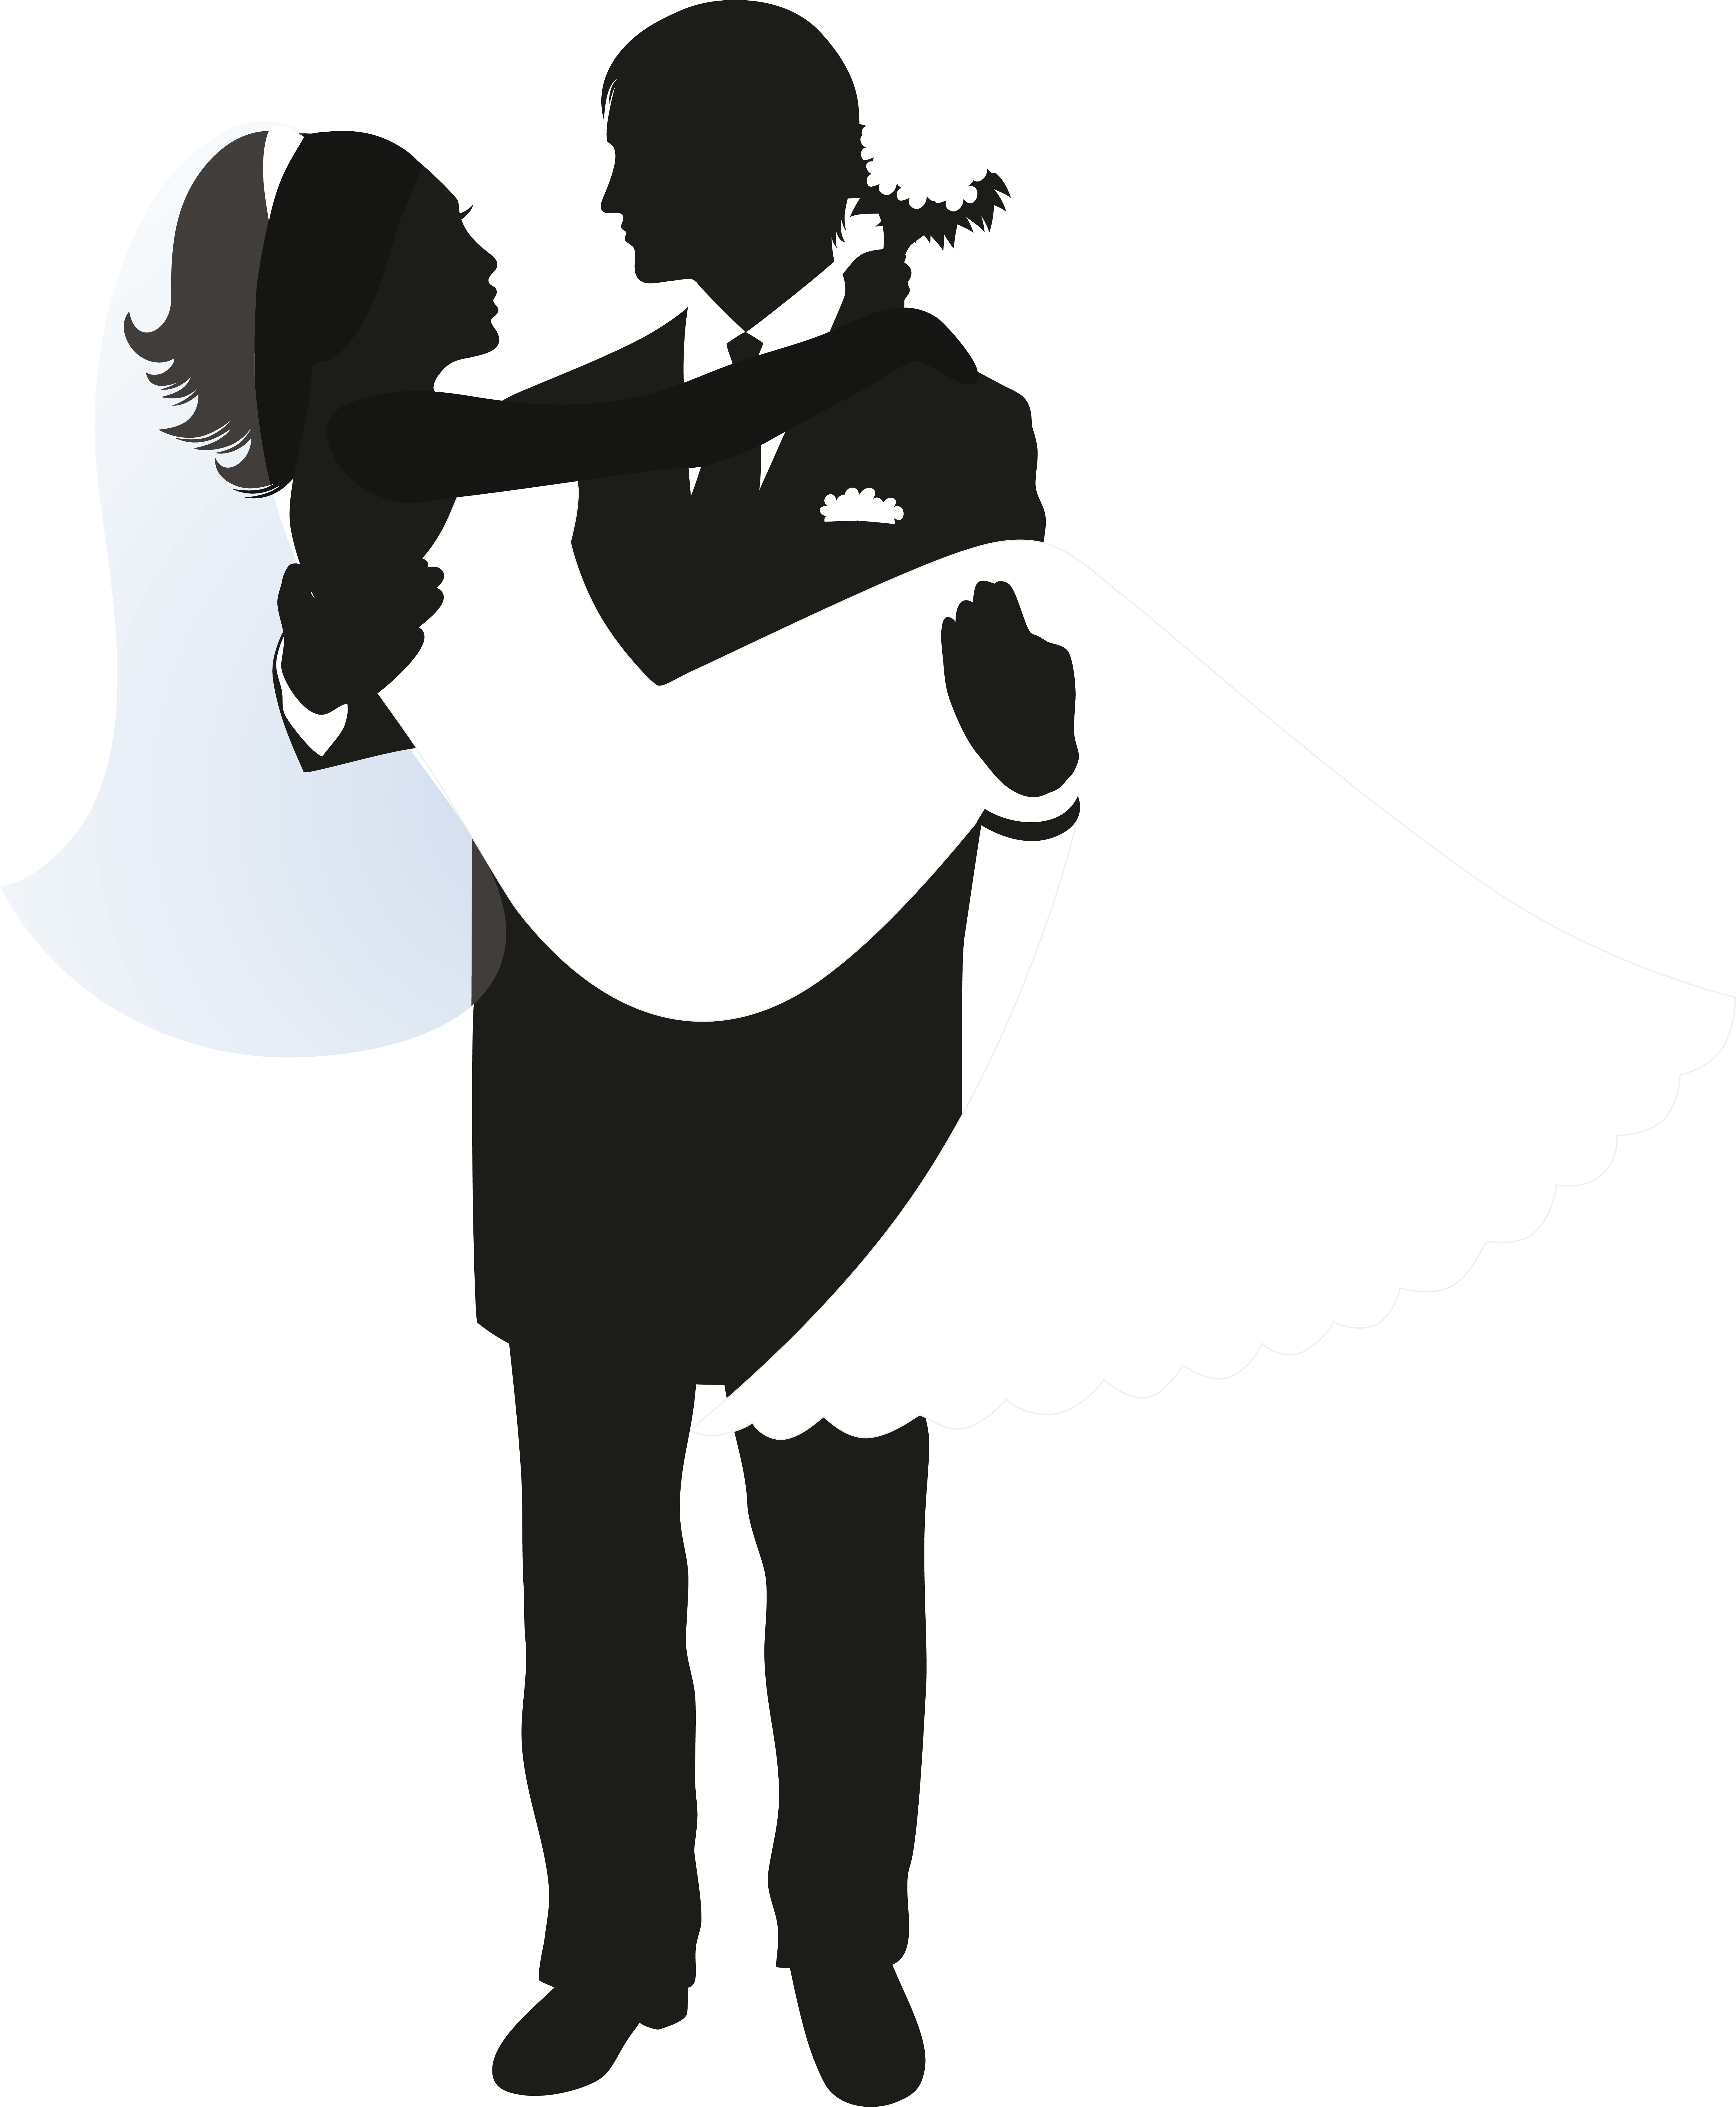 5739x6965 Wedding Invitation Silhouette Bridegroom